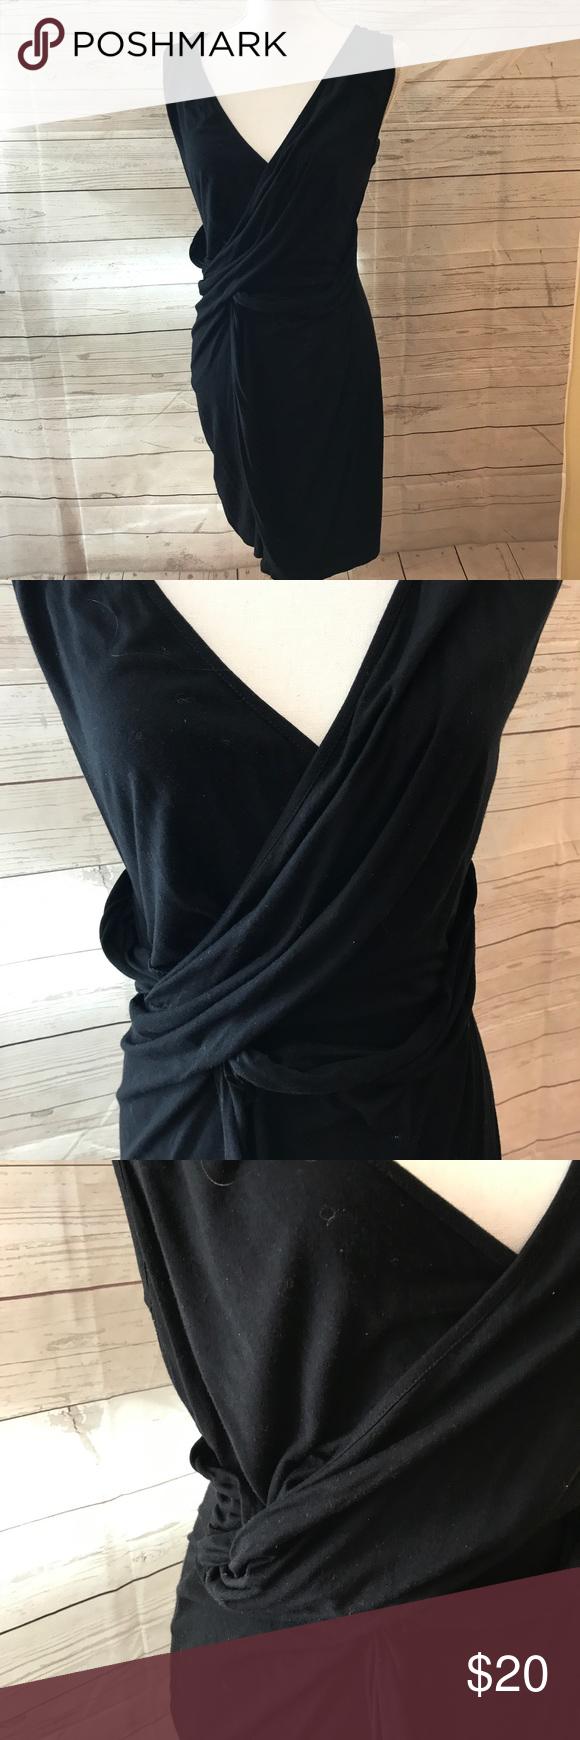 Asos petite black wrap dress lbd size asos petite wrap dresses